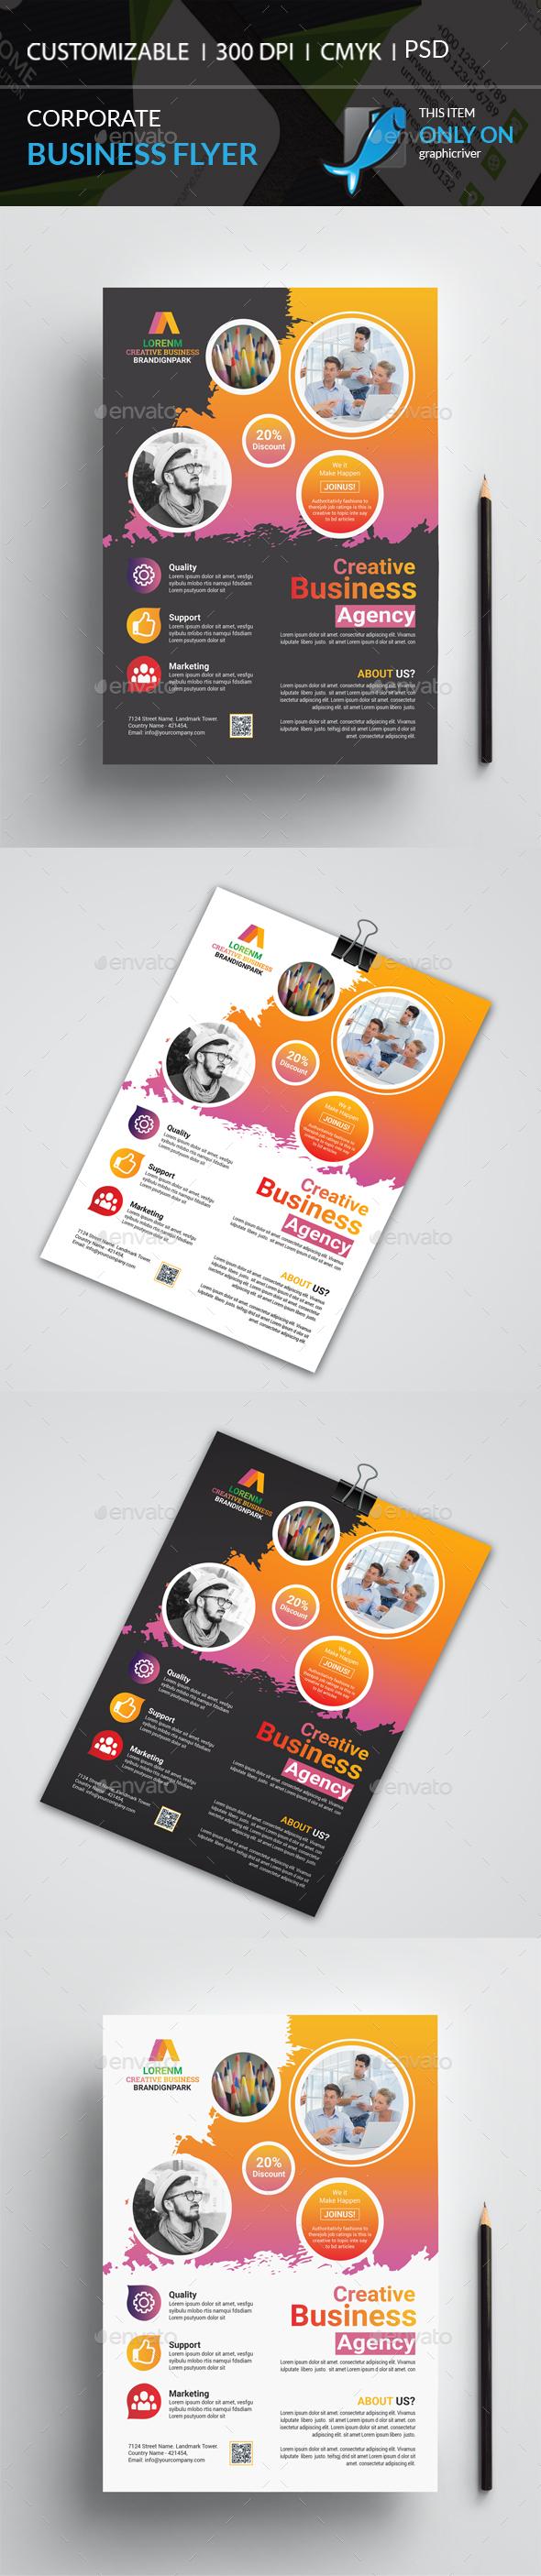 GraphicRiver Corporate Flyer 20802055